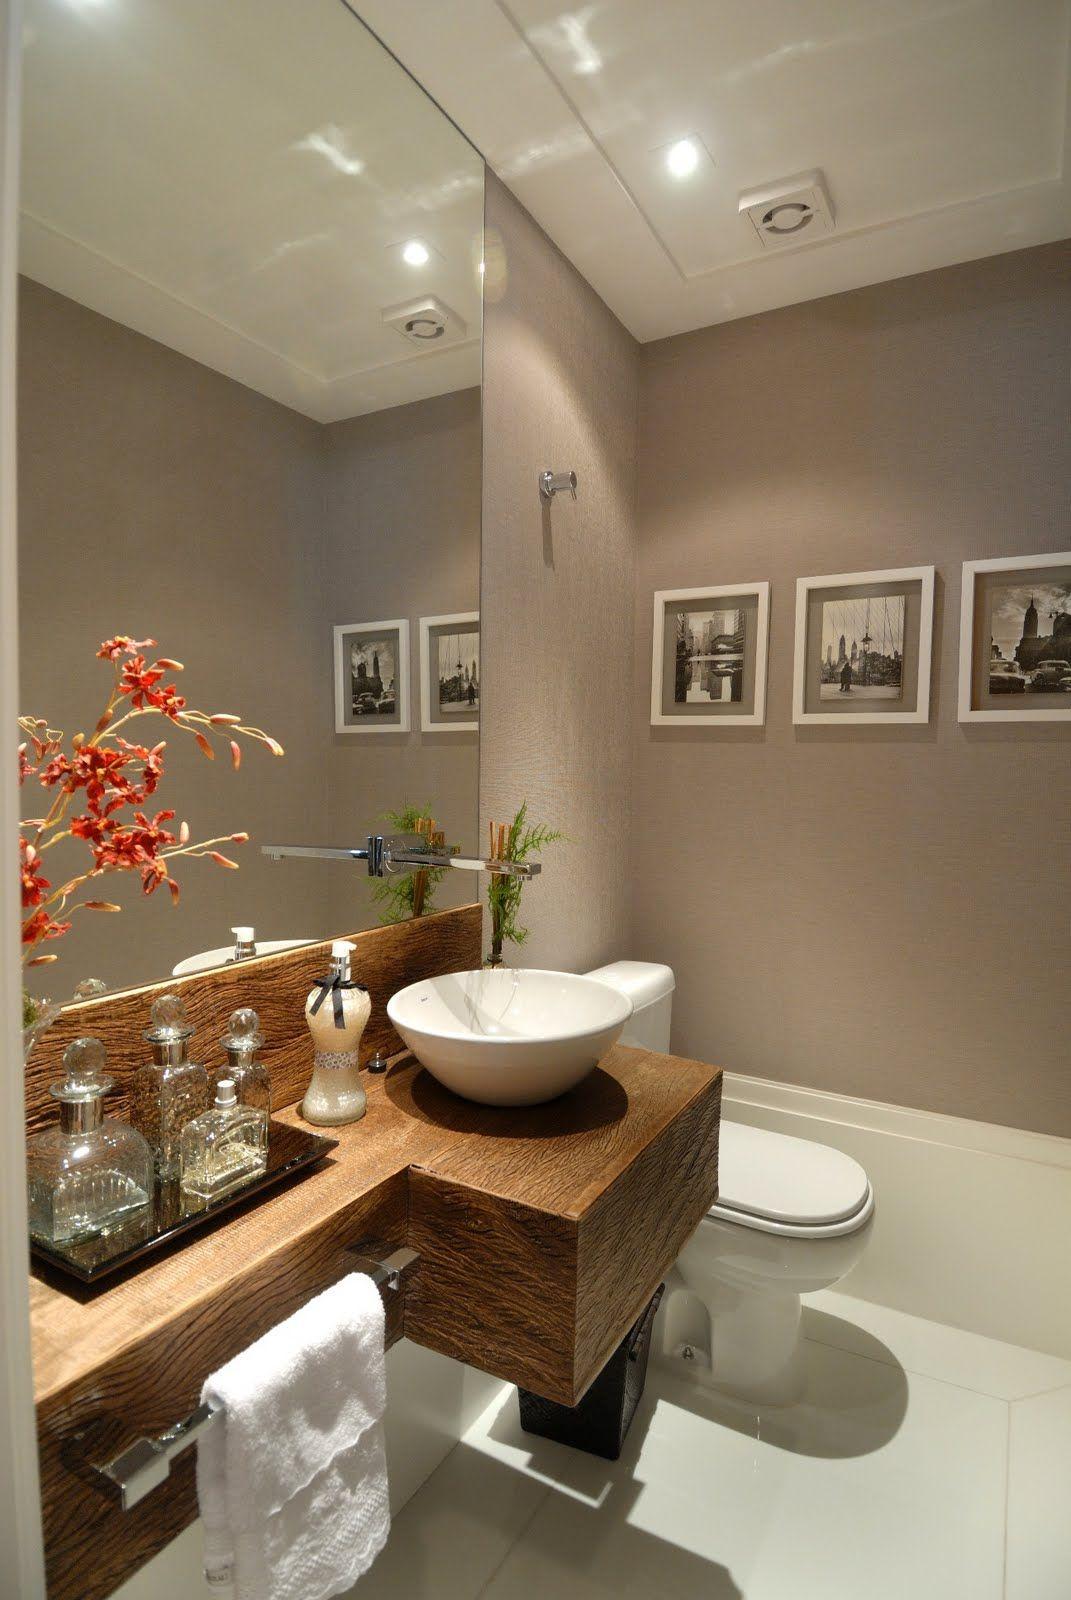 Bandeja Sobre A Pia Bathroom Pinterest Bath Shower Storage  # Muebles Leblon Cordoba